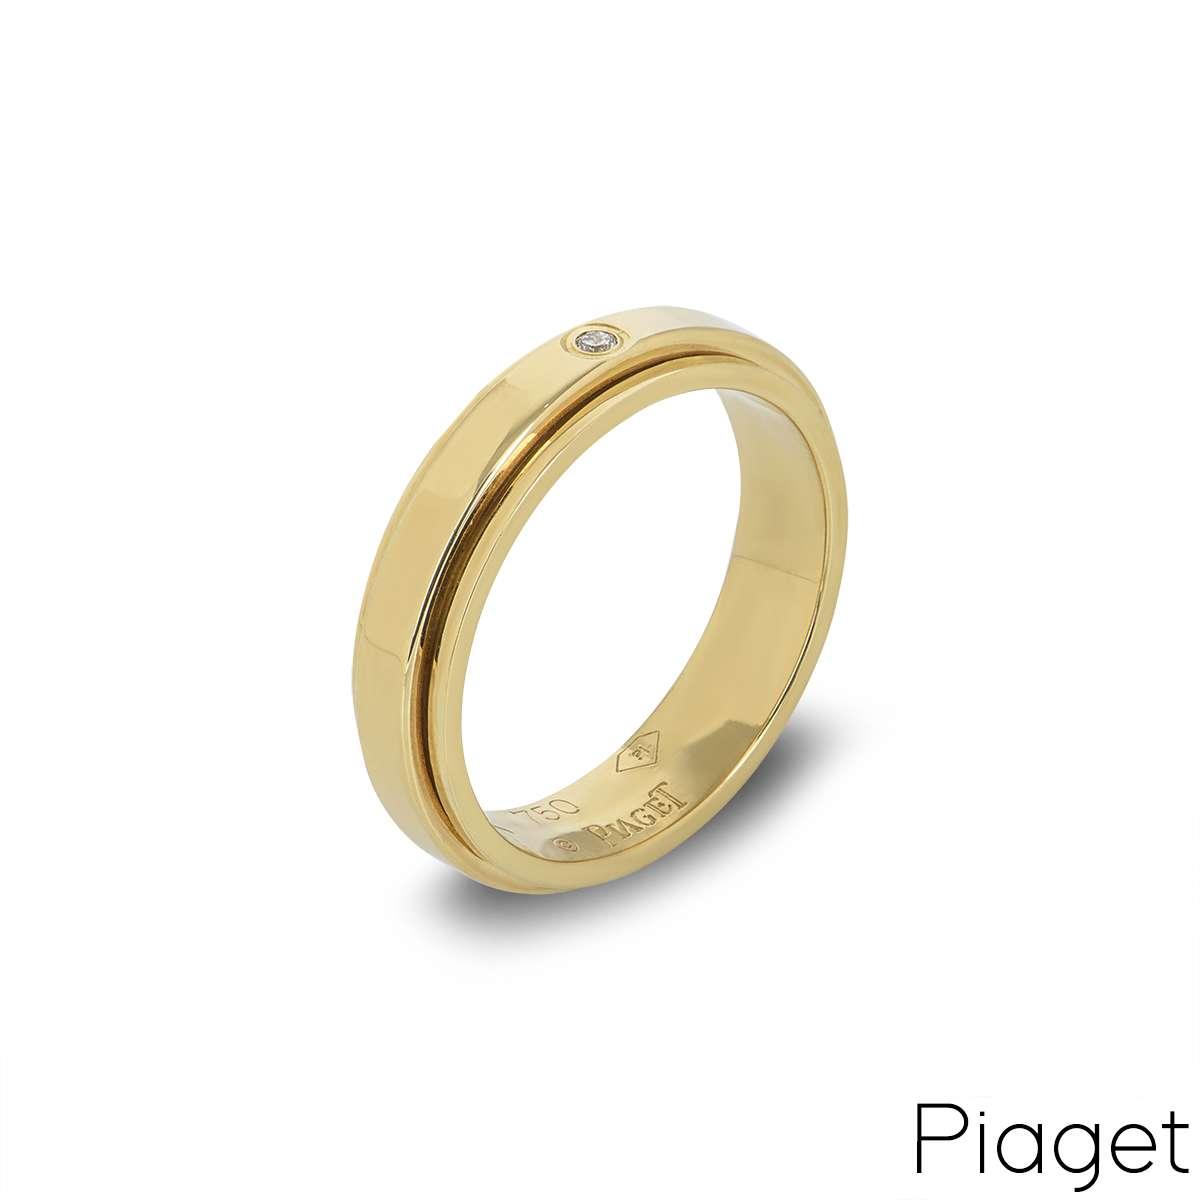 Piaget 18k Yellow Gold Diamond Set Possession Ring B&P G34PJ855